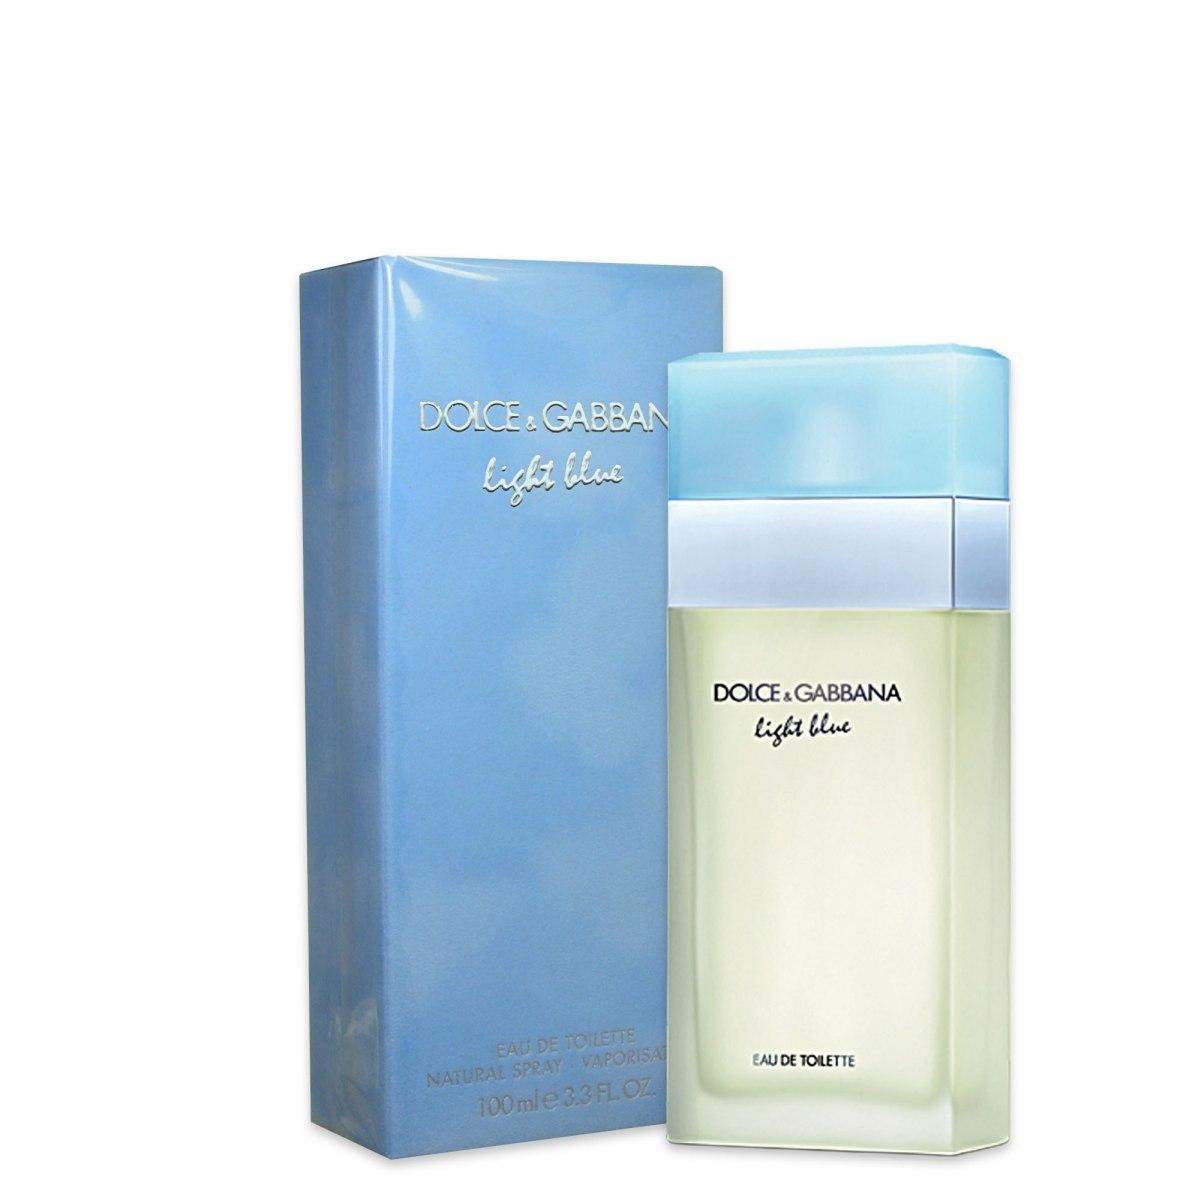 dolce gabbana dolce gabbana light blue 100ml femme d g7832. Black Bedroom Furniture Sets. Home Design Ideas